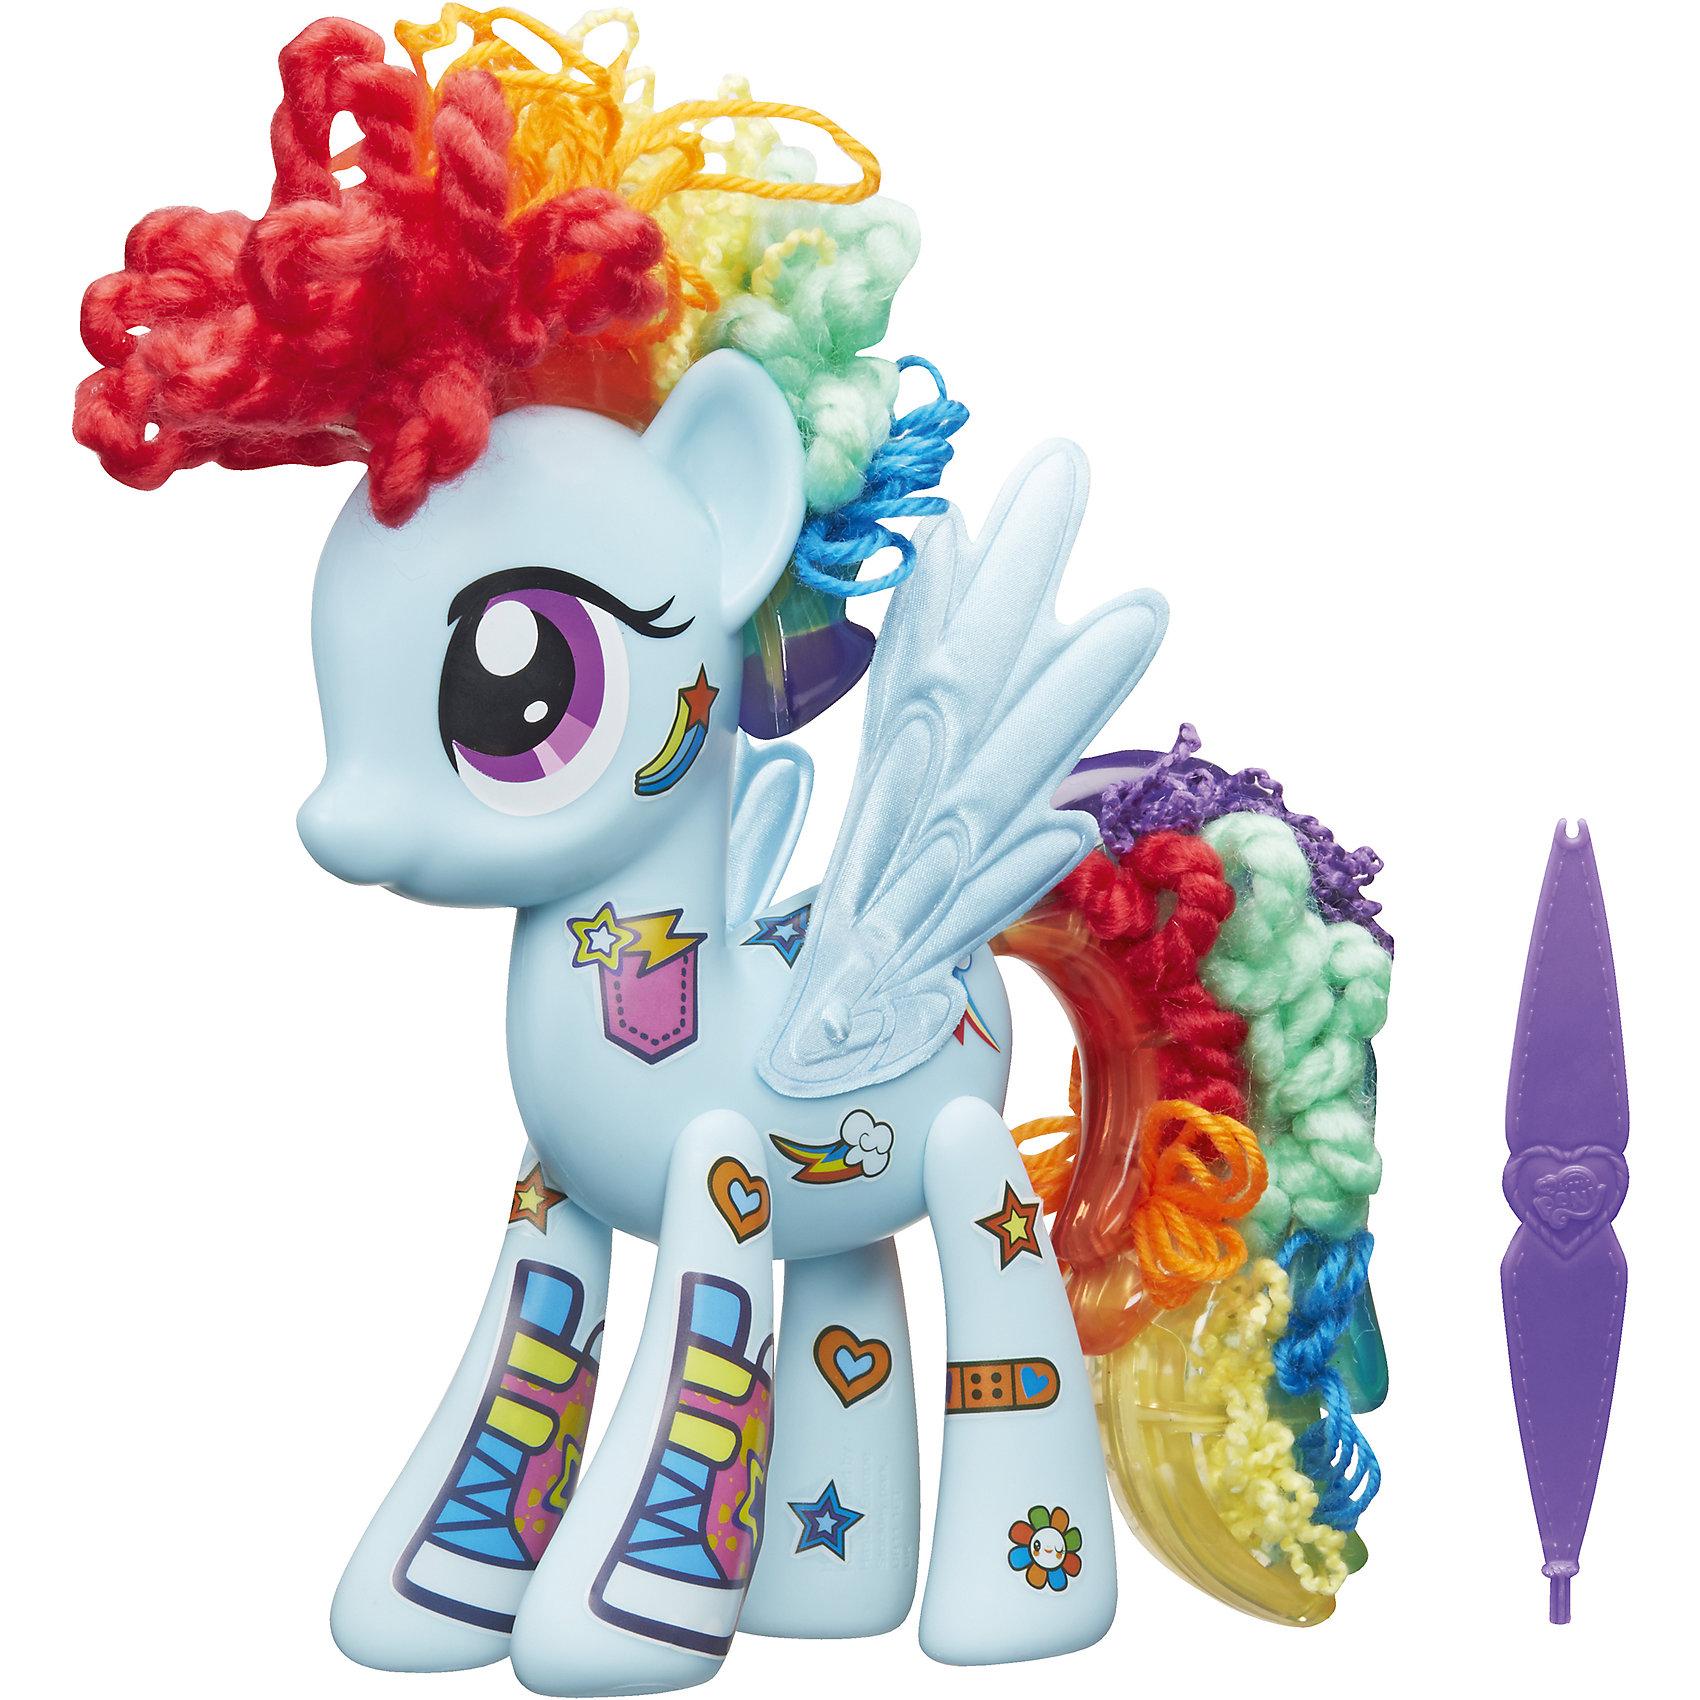 Hasbro Игровой набор Создай свою пони, My little Pony hasbro hasbro my little pony игровой набор поезд дружбы